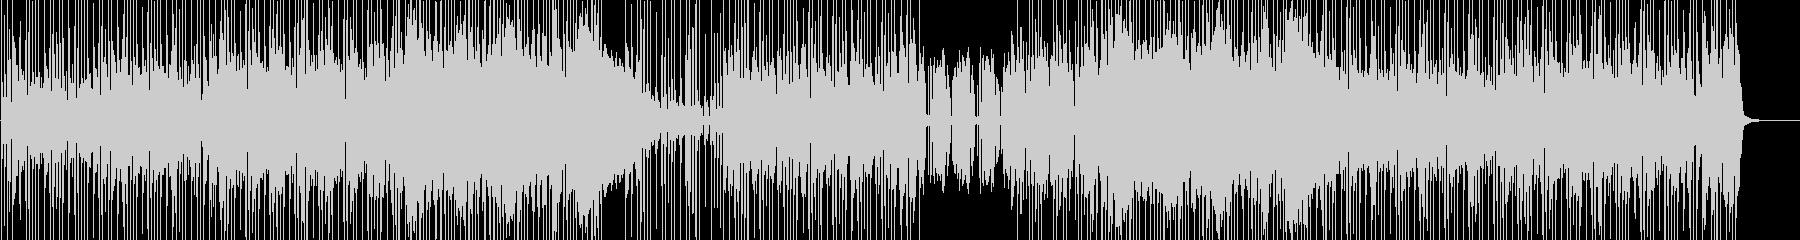 80'sファンク、ソウルの未再生の波形